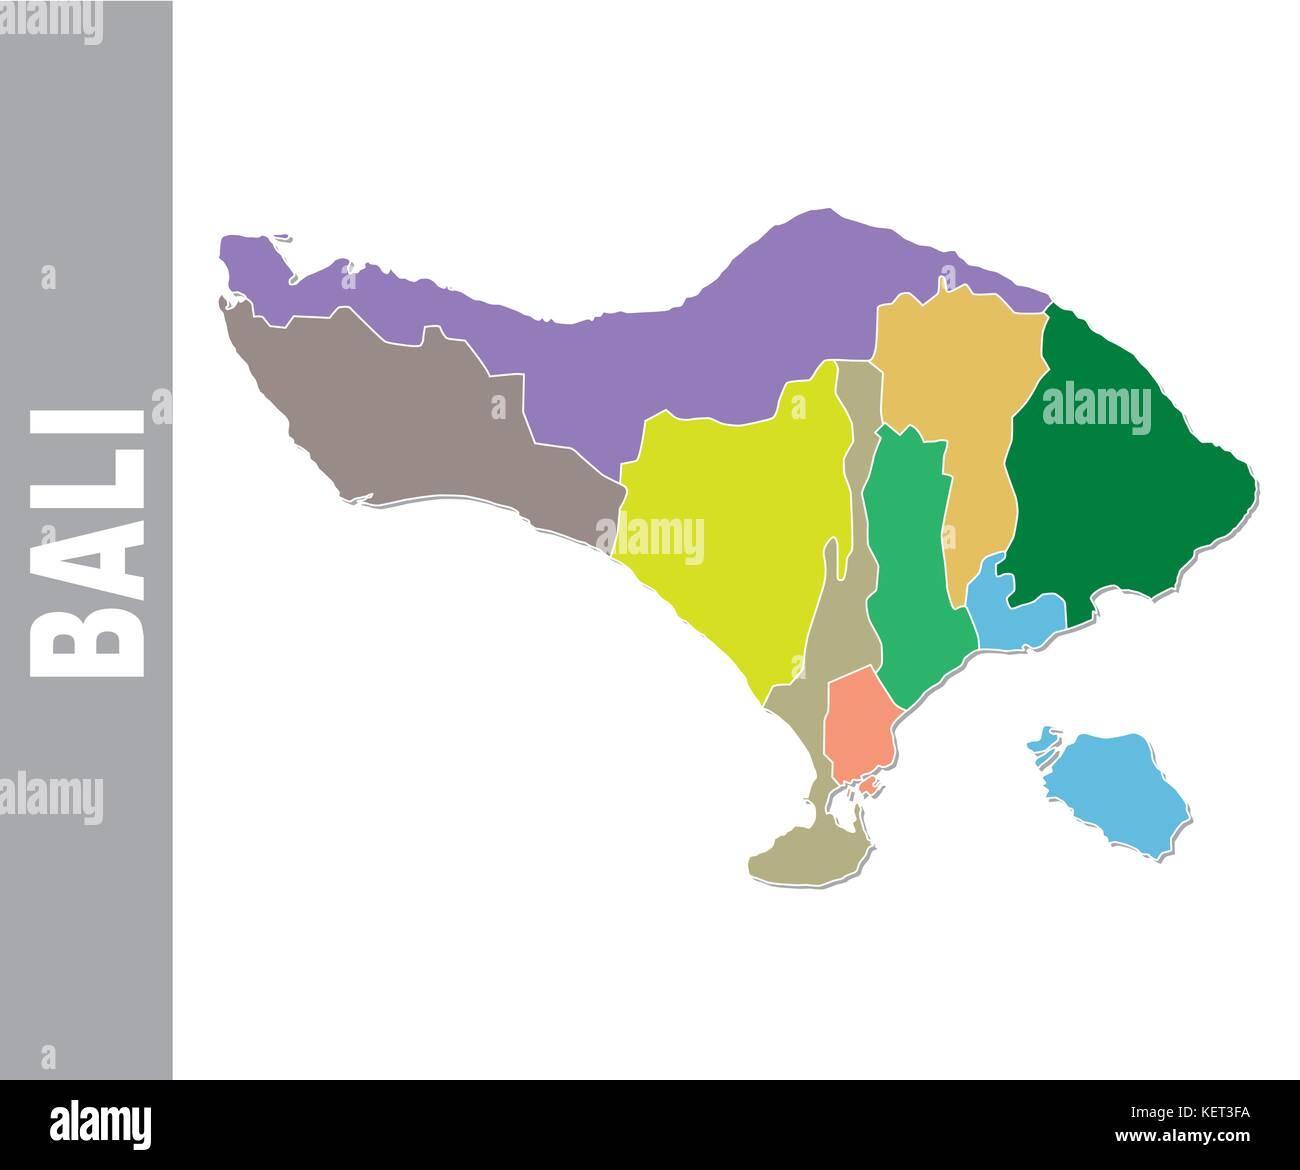 Bali Map Vector Stock Photos Bali Map Vector Stock Images